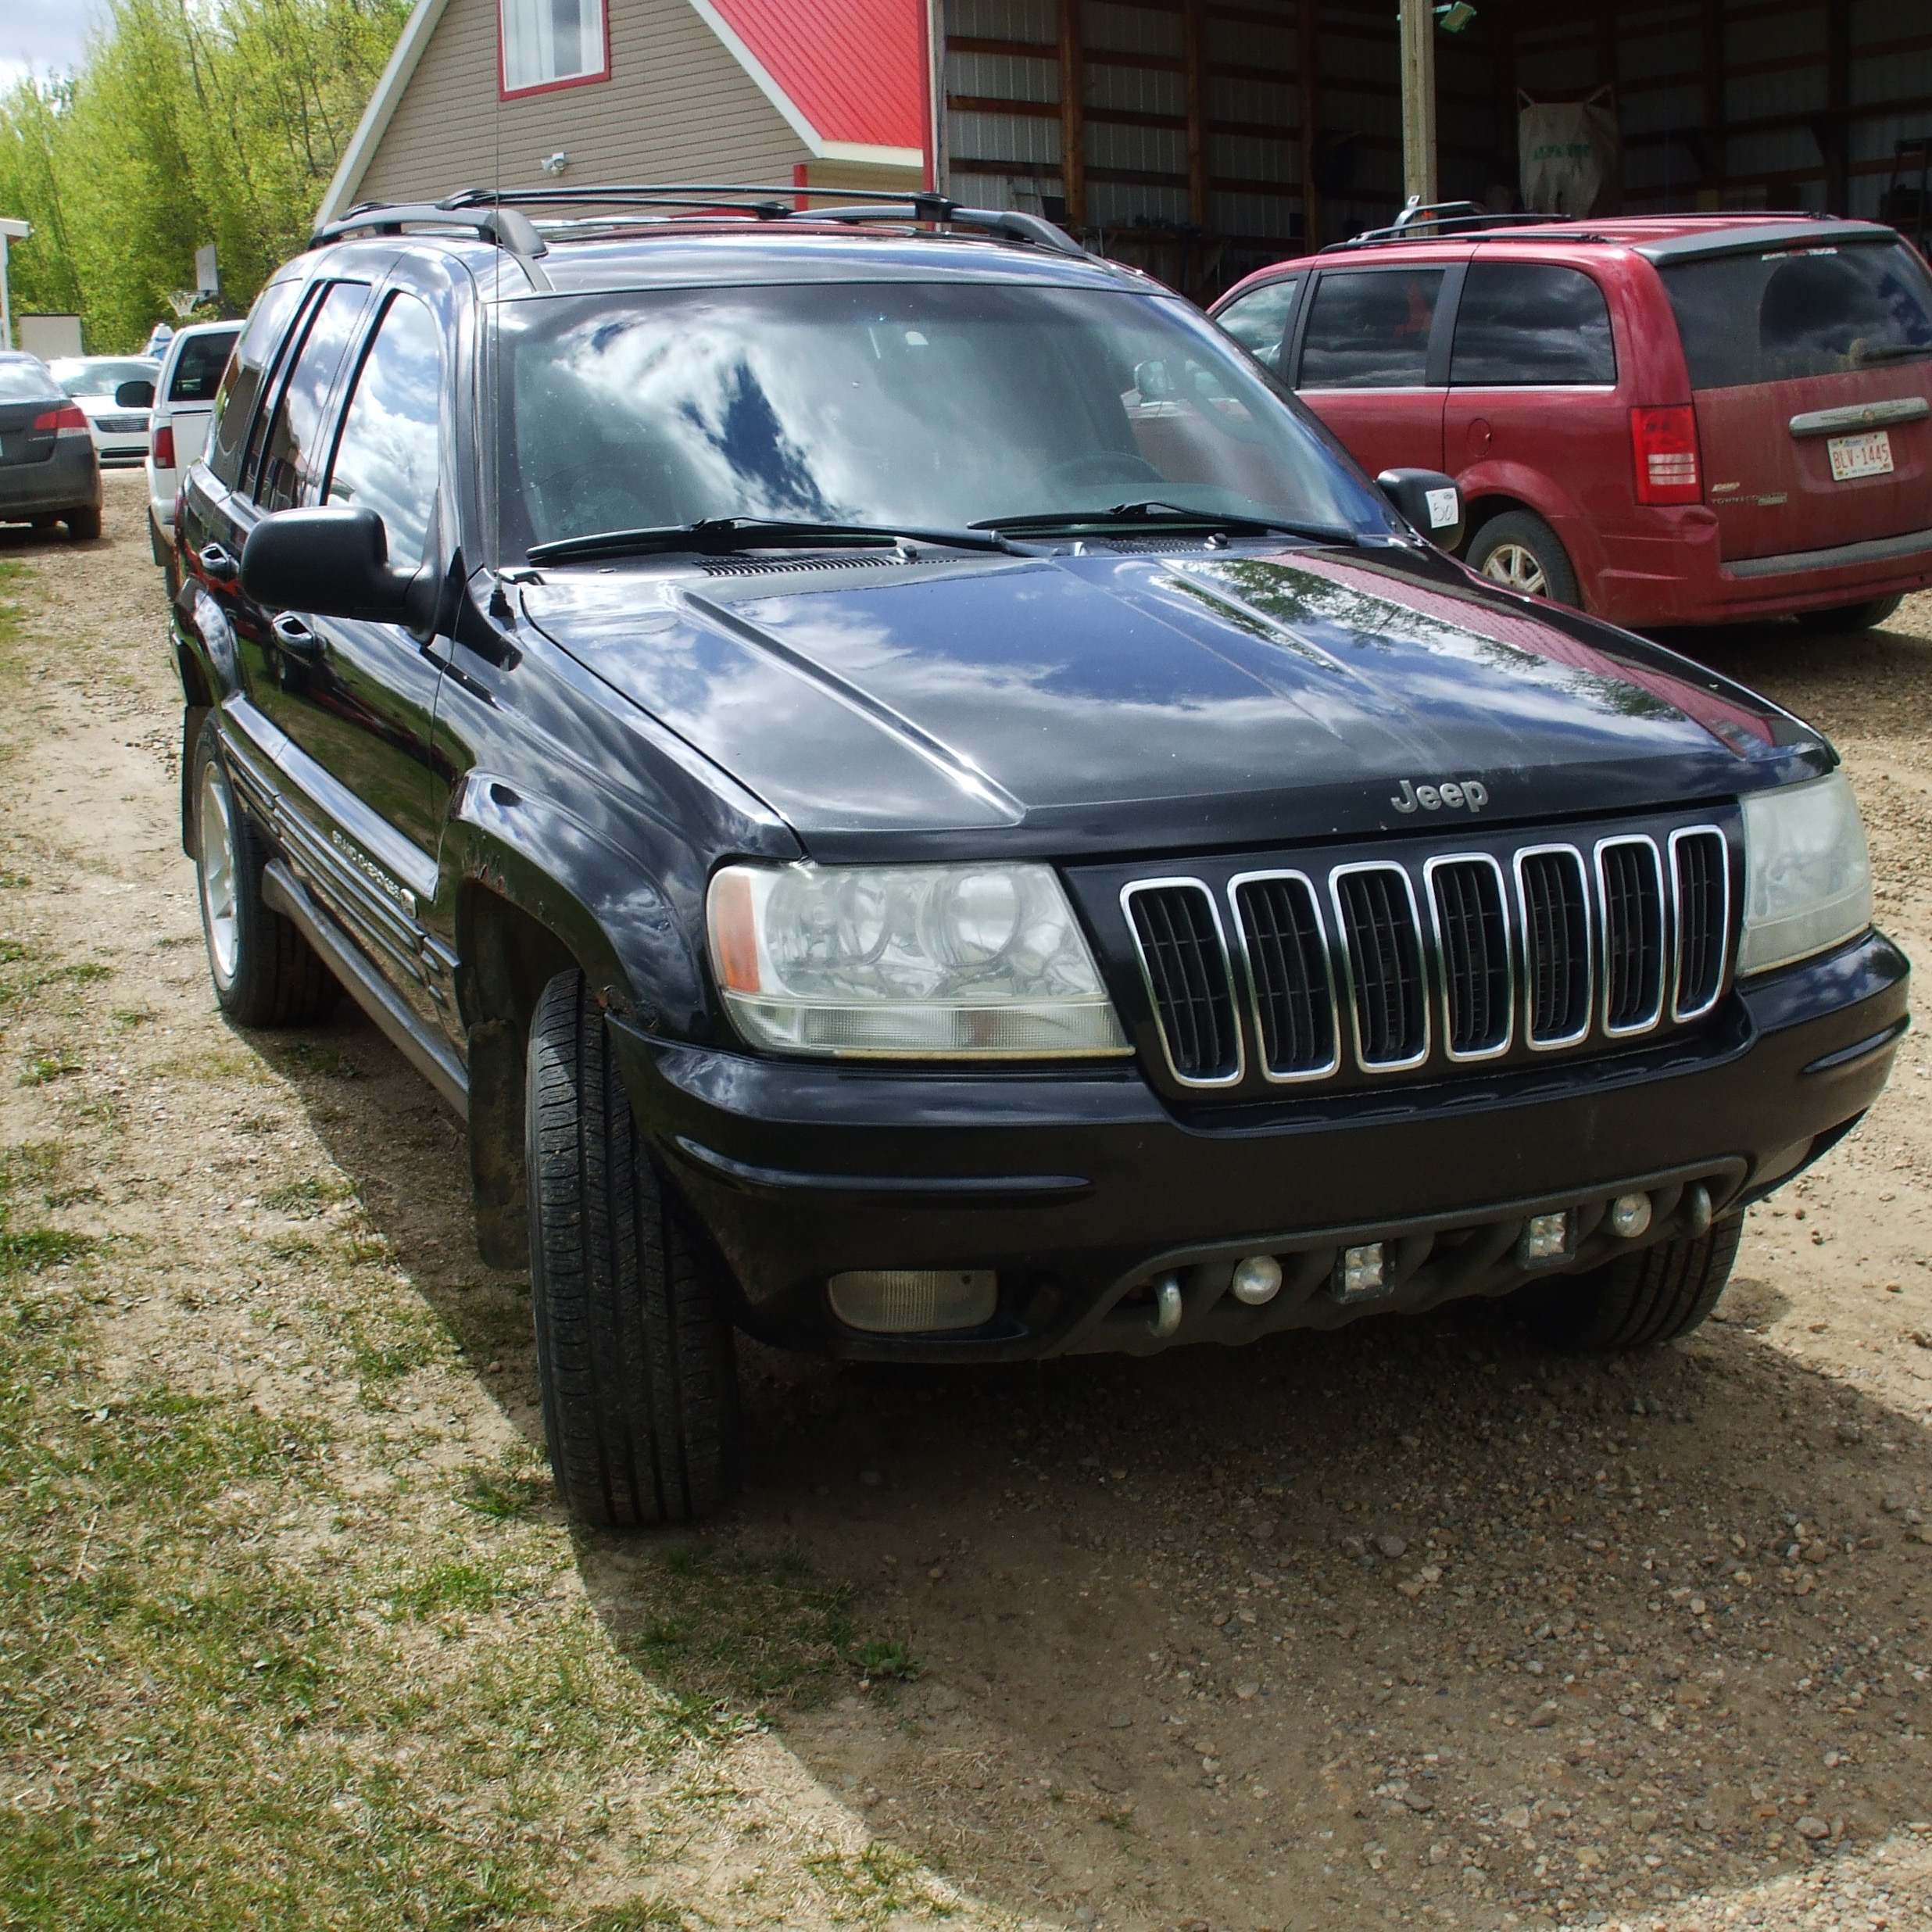 2002 Jeep, SUV ,black, 224,000 km sn: 1J8GW68J73C528479 - Image 5 of 6